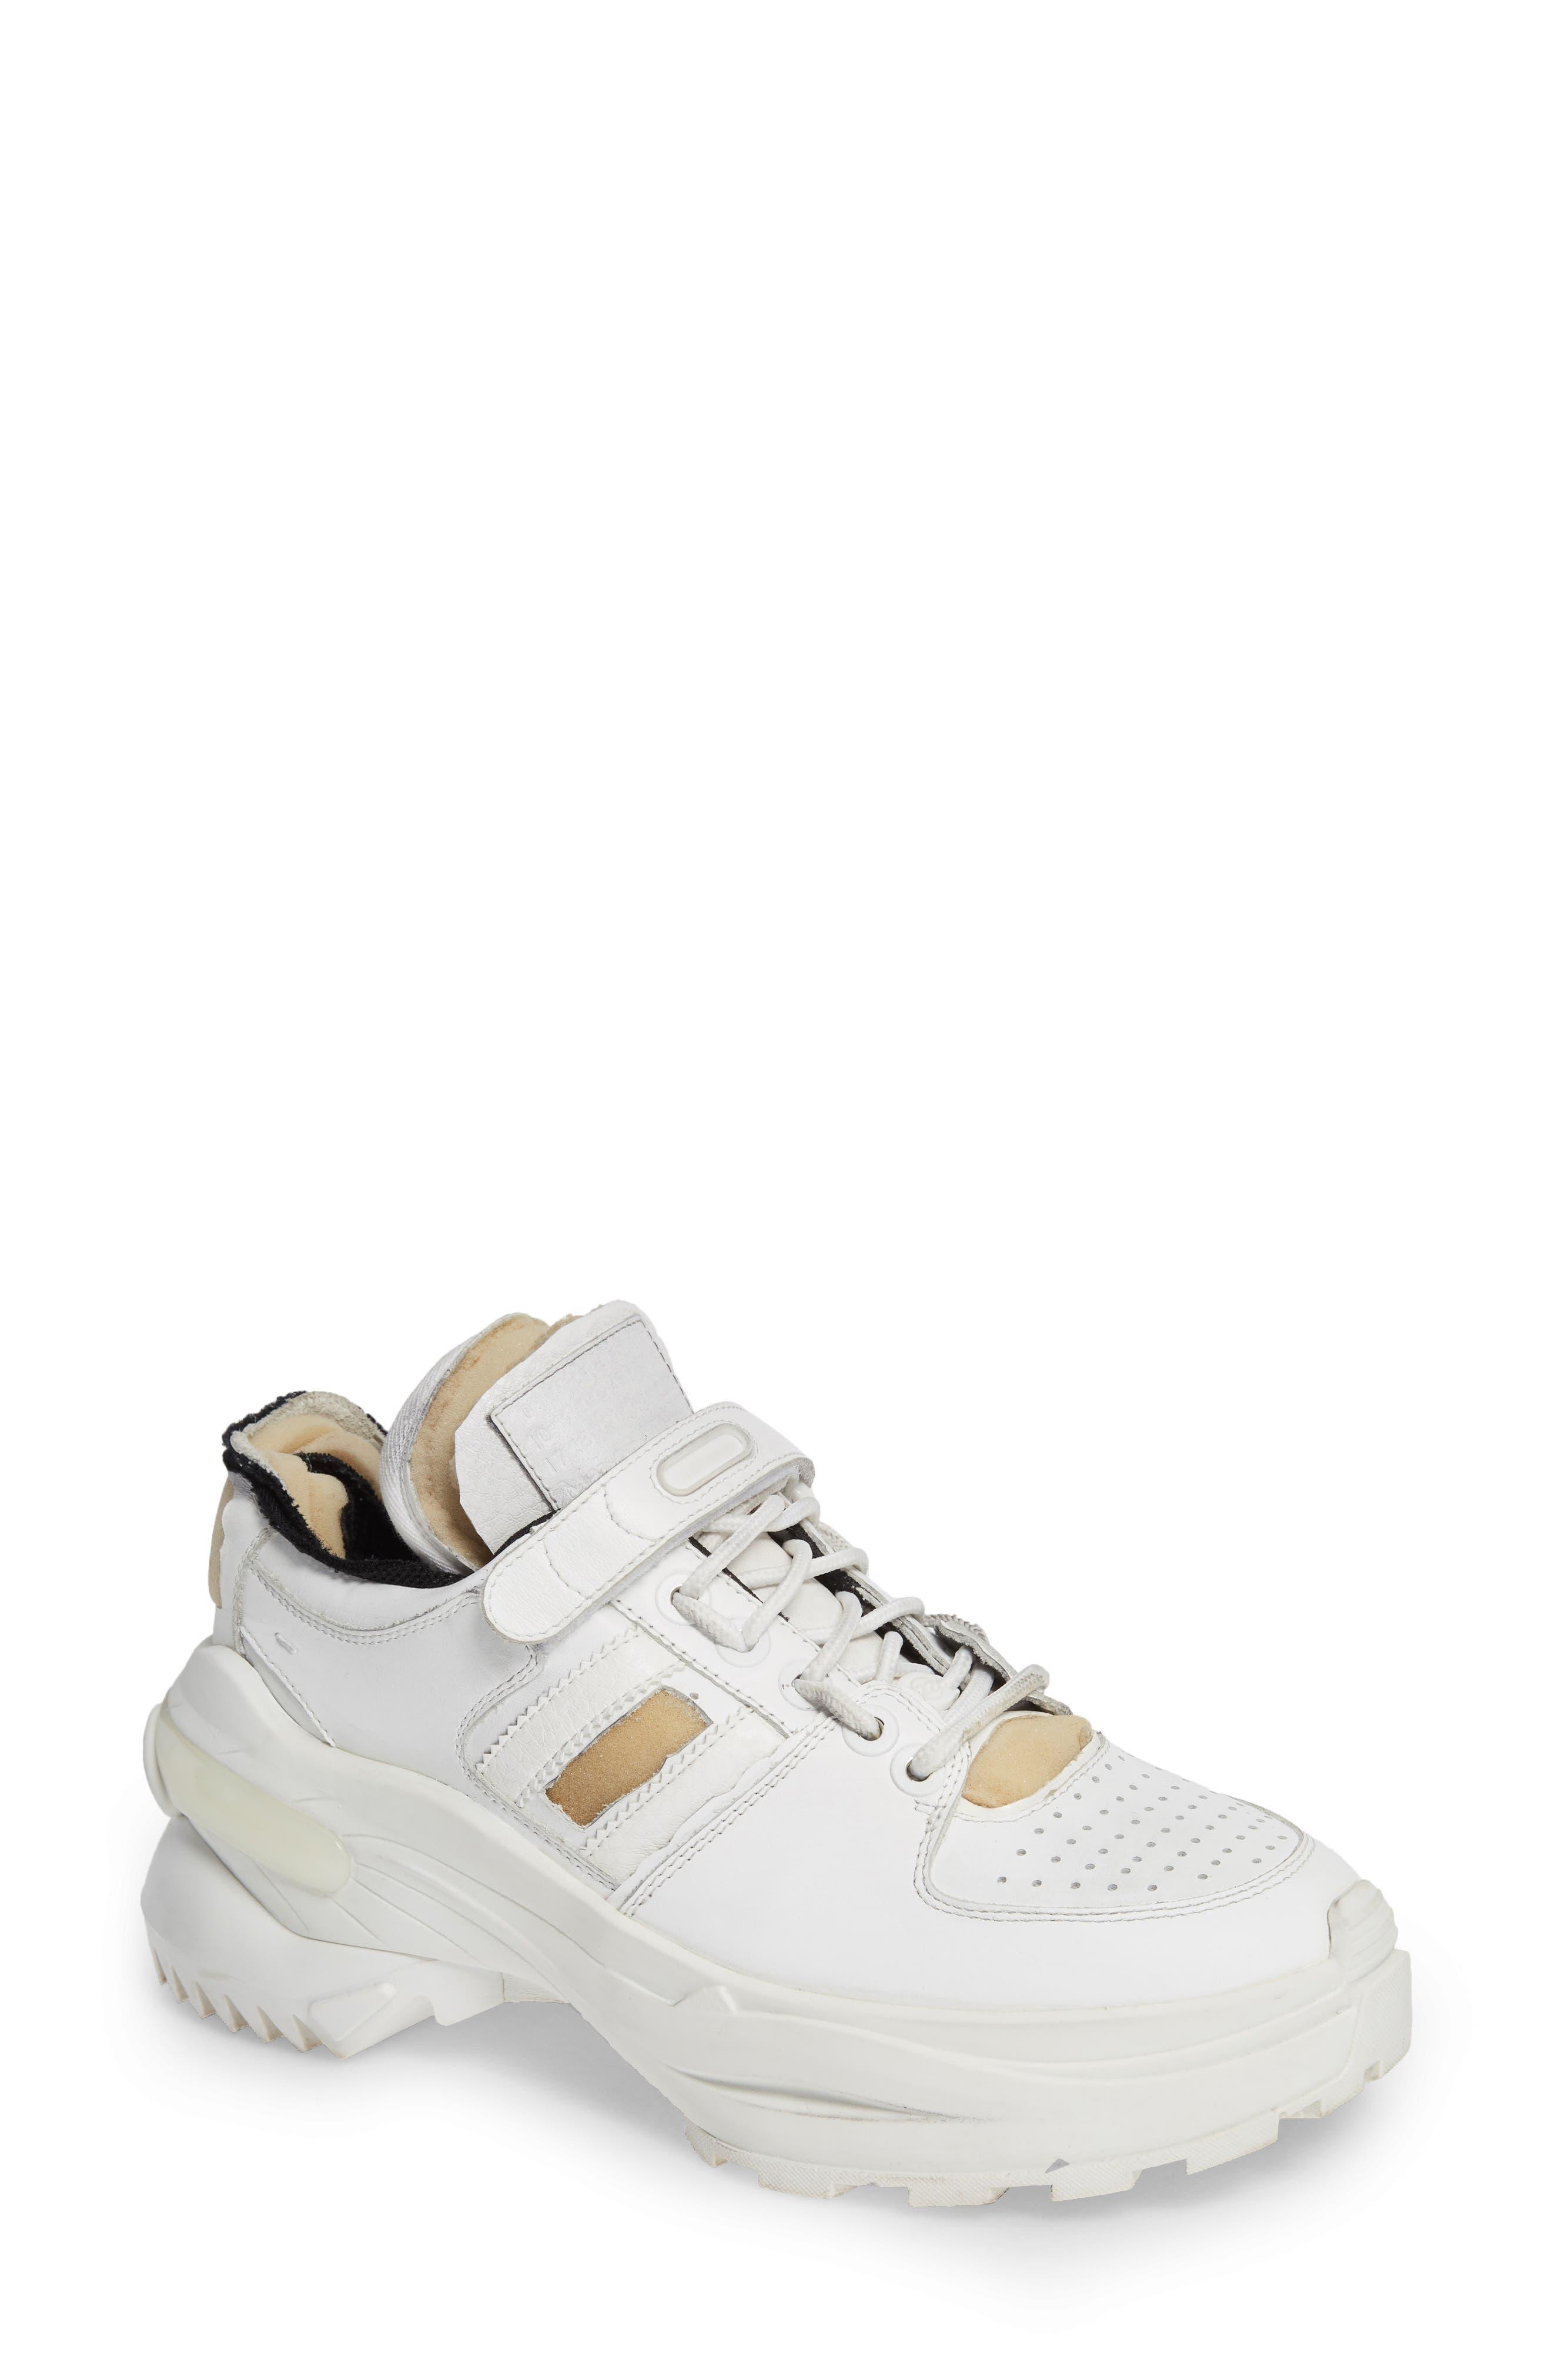 MAISON MARGIELA, Retro Fit Destroyed Sneaker, Main thumbnail 1, color, WHITE